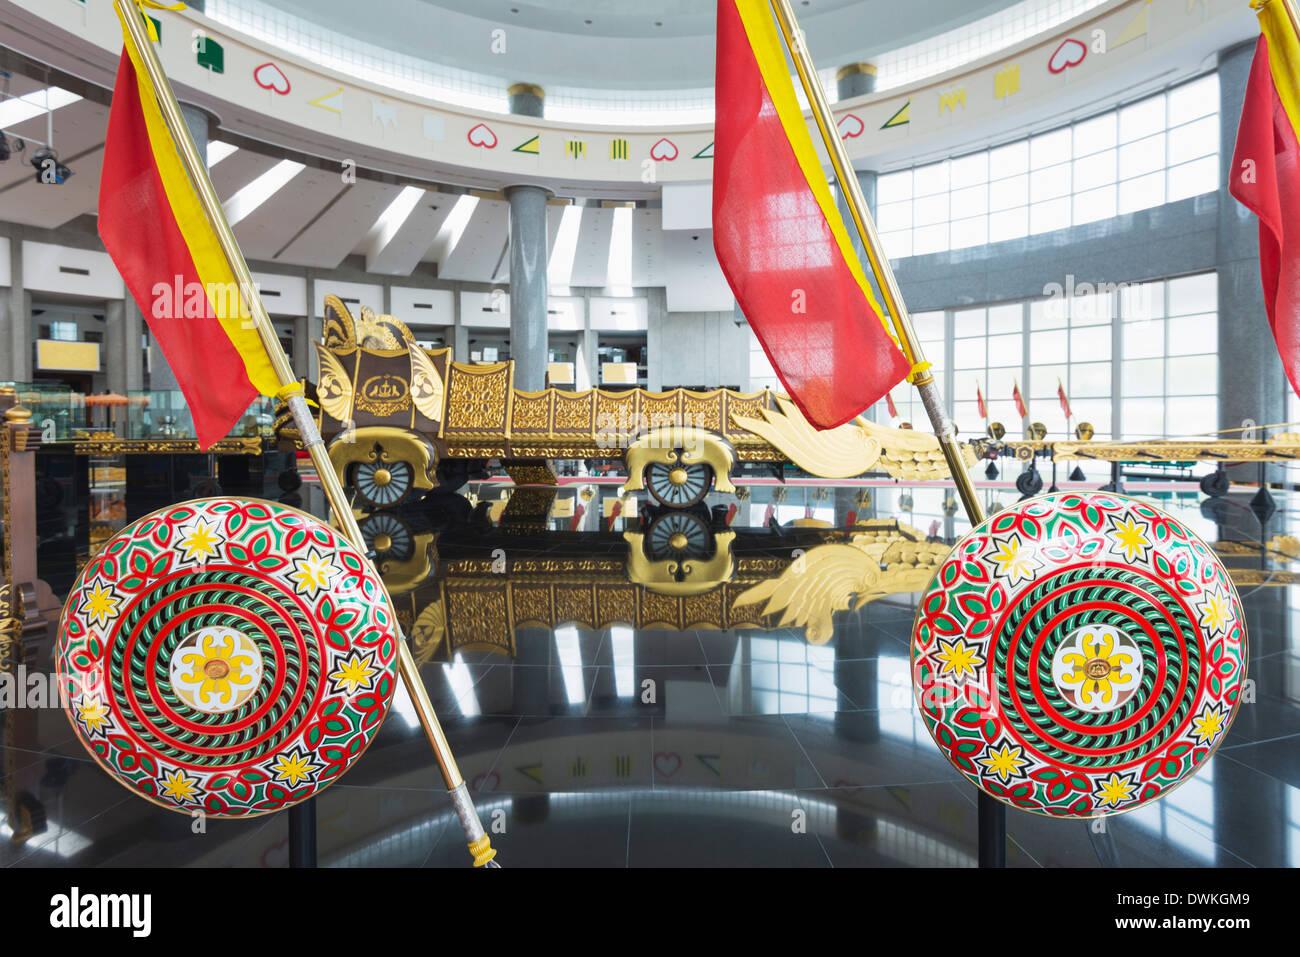 Royal Regalia Museum, Bandar Seri Begawan, Brunei, Borneo, Southeast Asia, Asia - Stock Image